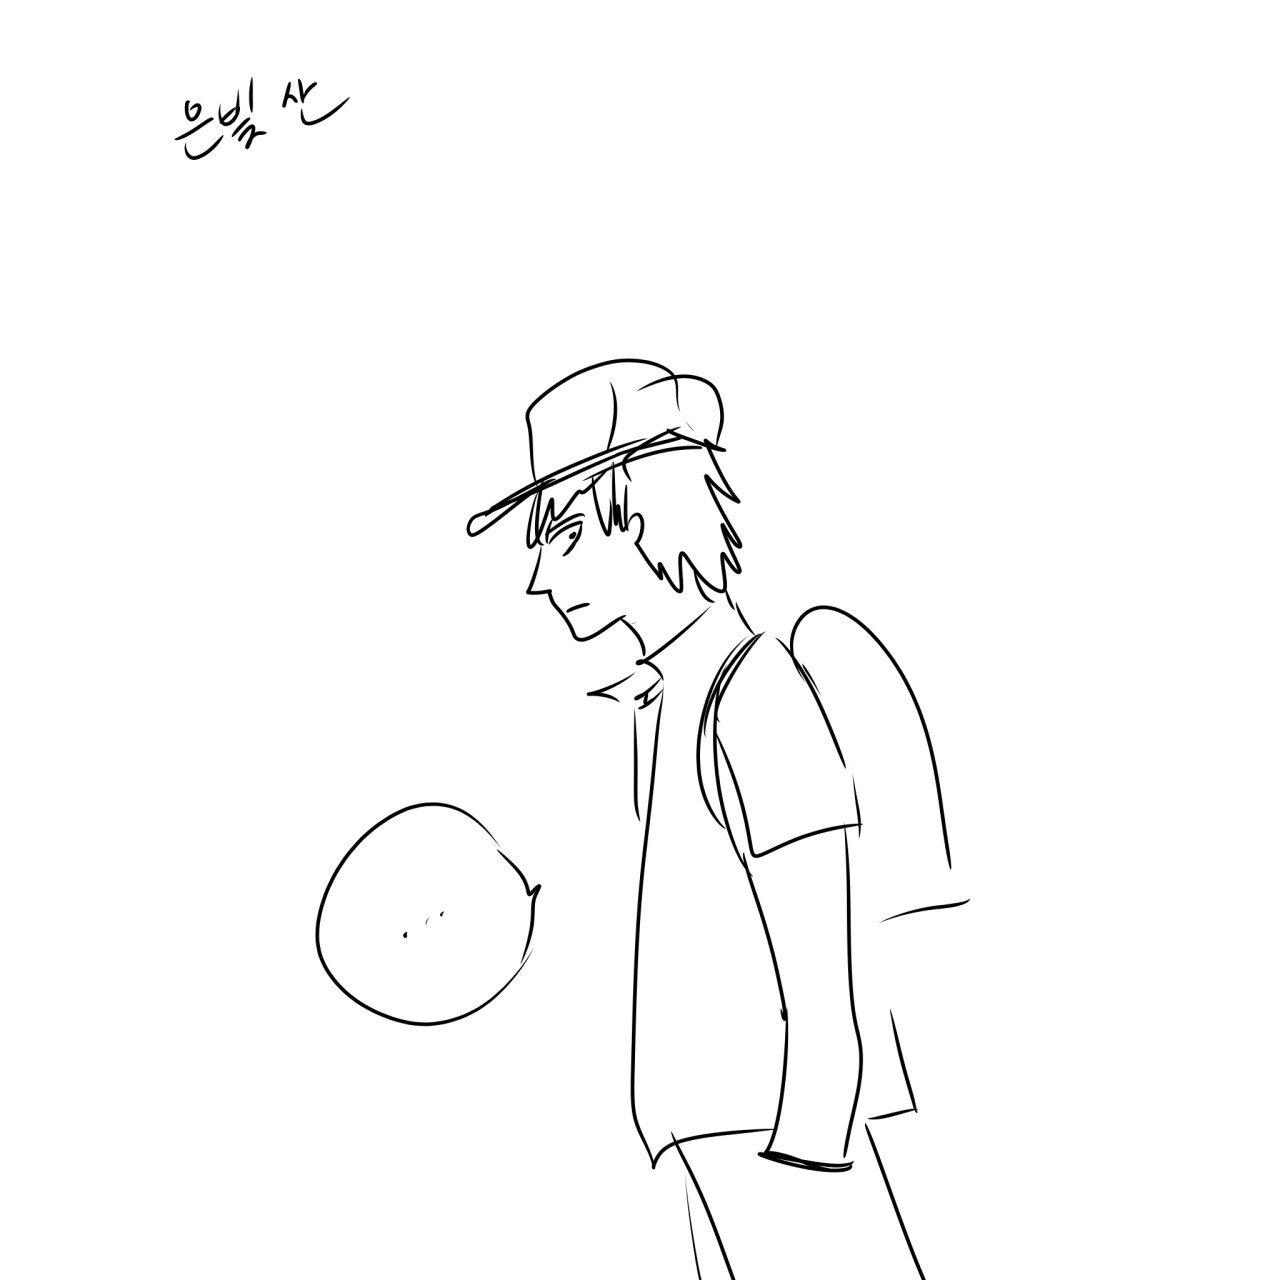 cartoon-20190528-184810-016.jpg 포켓몬 테러리스트 만화.manwha 포켓몬 극한의 효율충...MANHWA